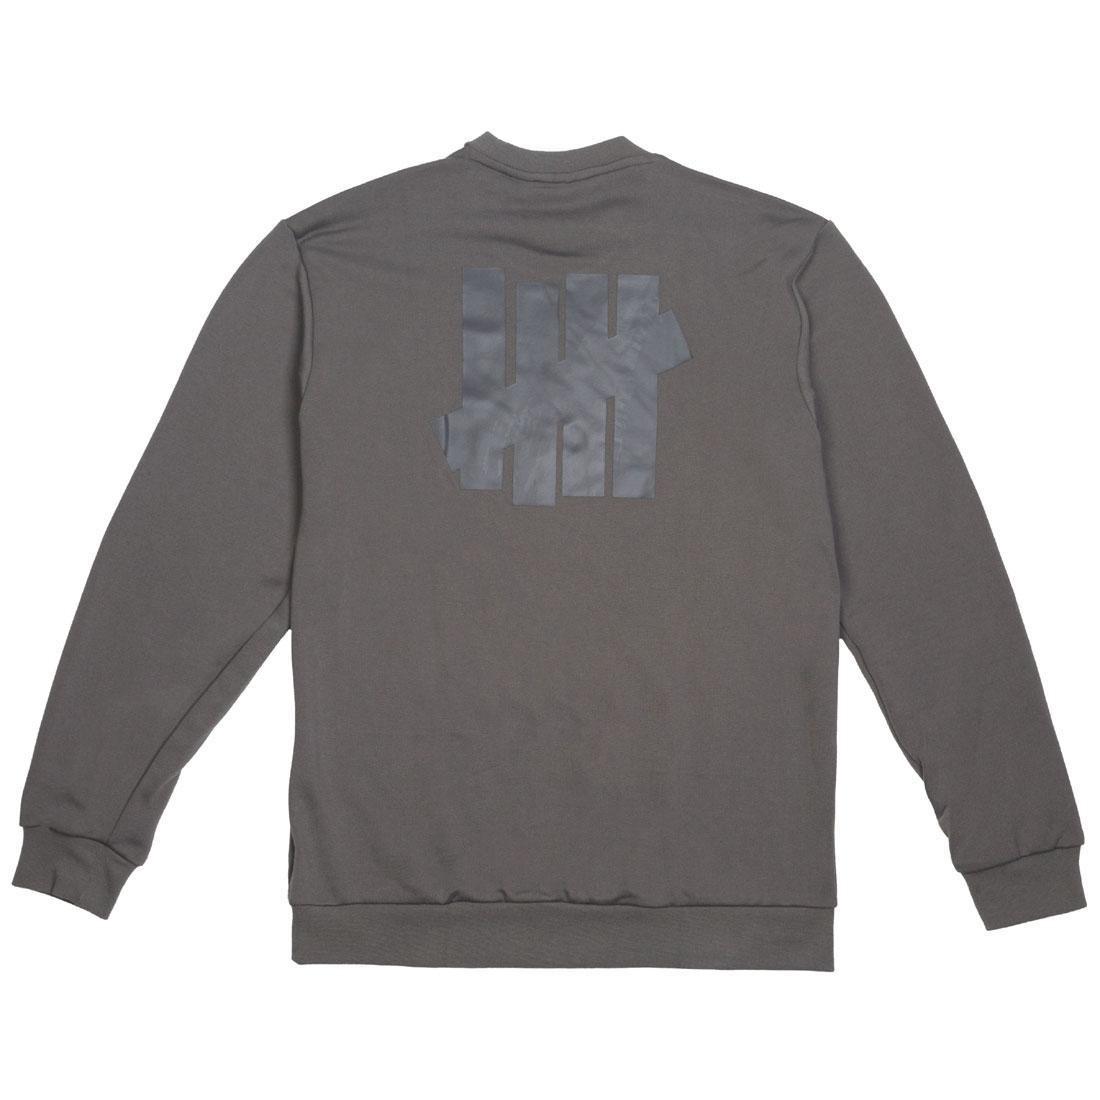 Adidas x Undefeated Men Running Crew Sweater (gray / cinder / utility black)